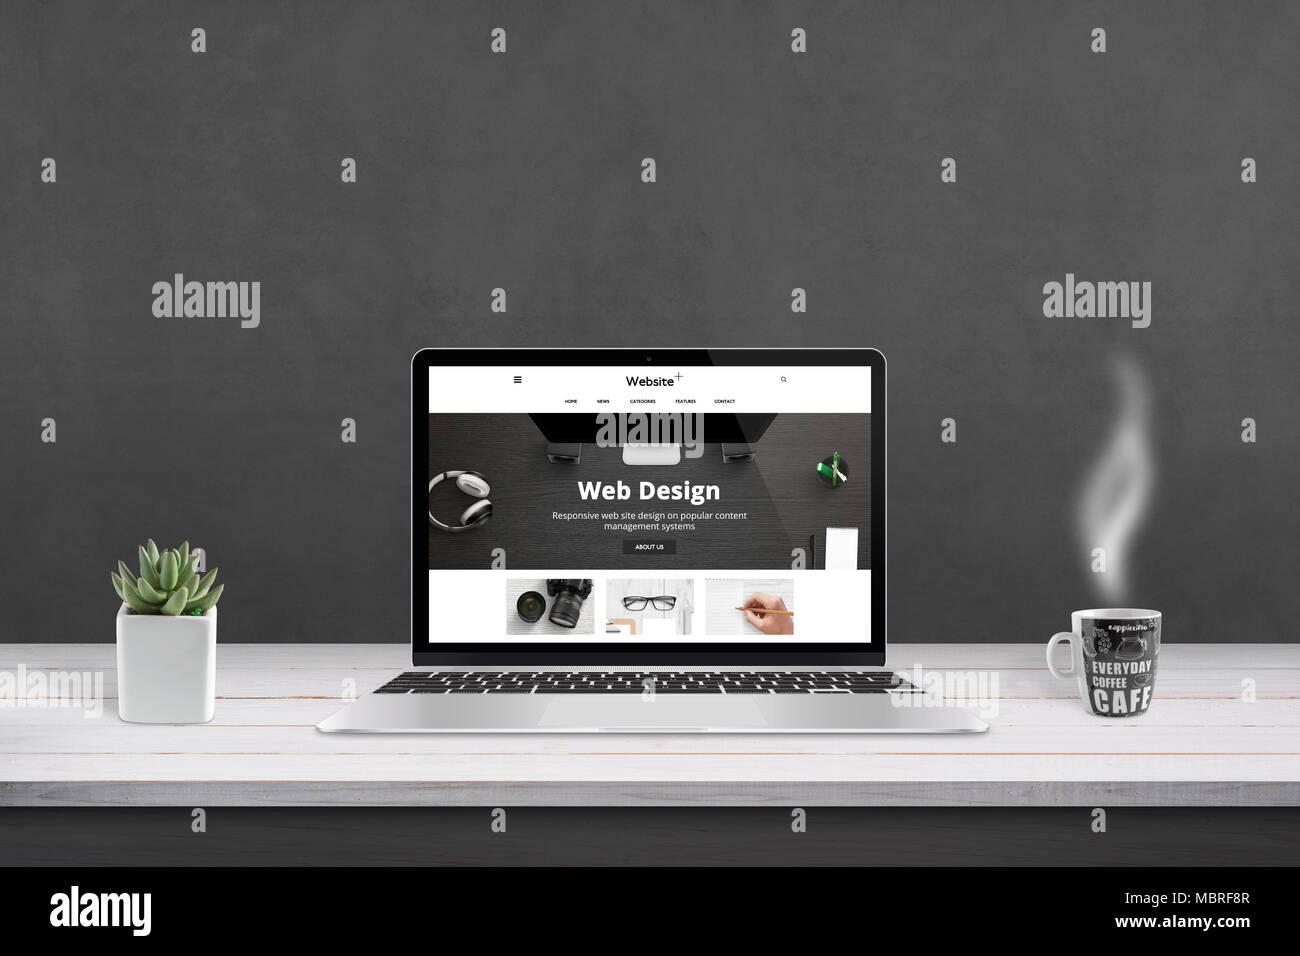 web design agency presentation with responsive flat web site design